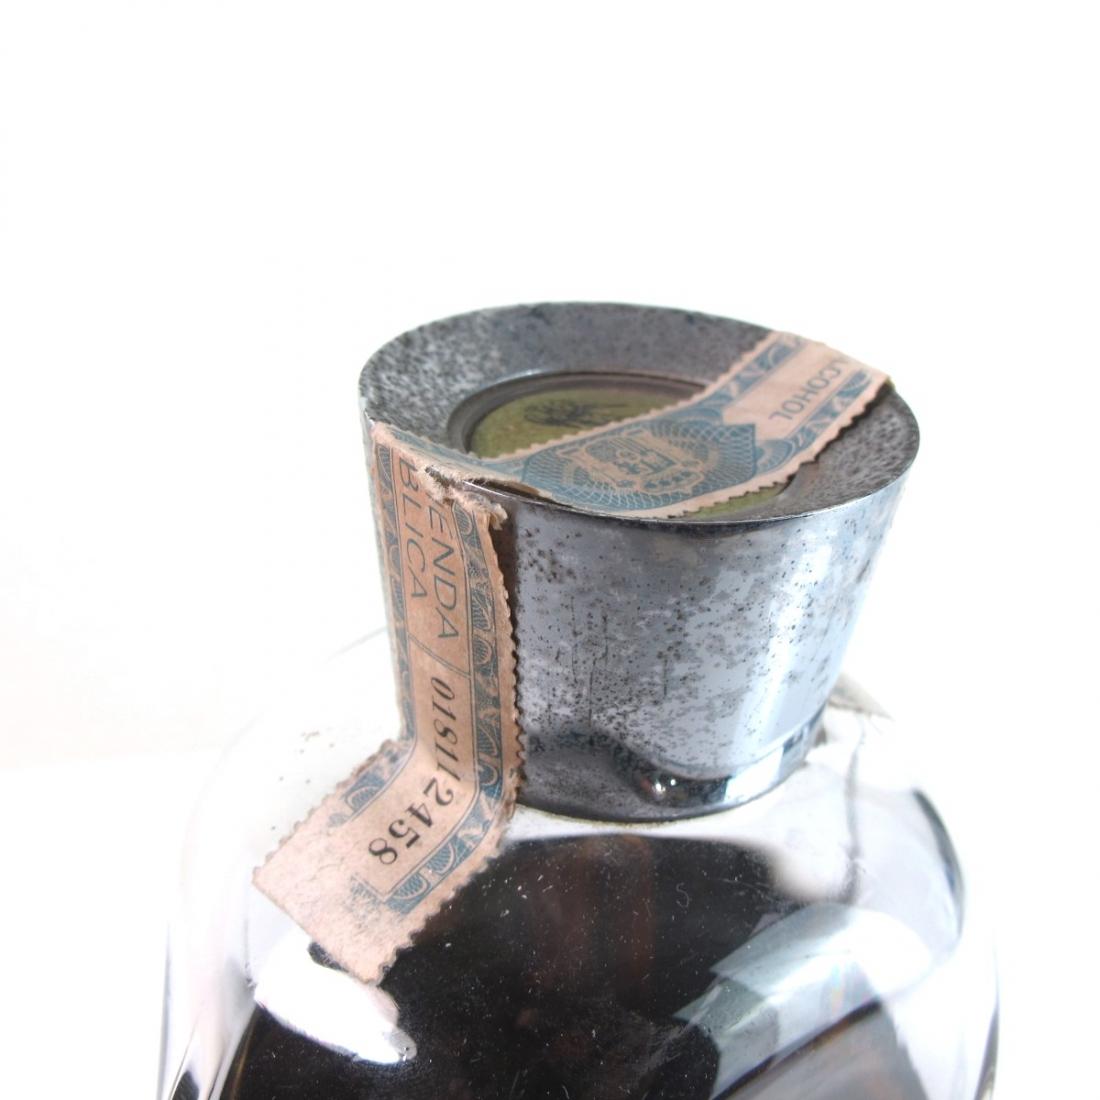 Delamain Cognac Tres Venerable De Grande Champagne